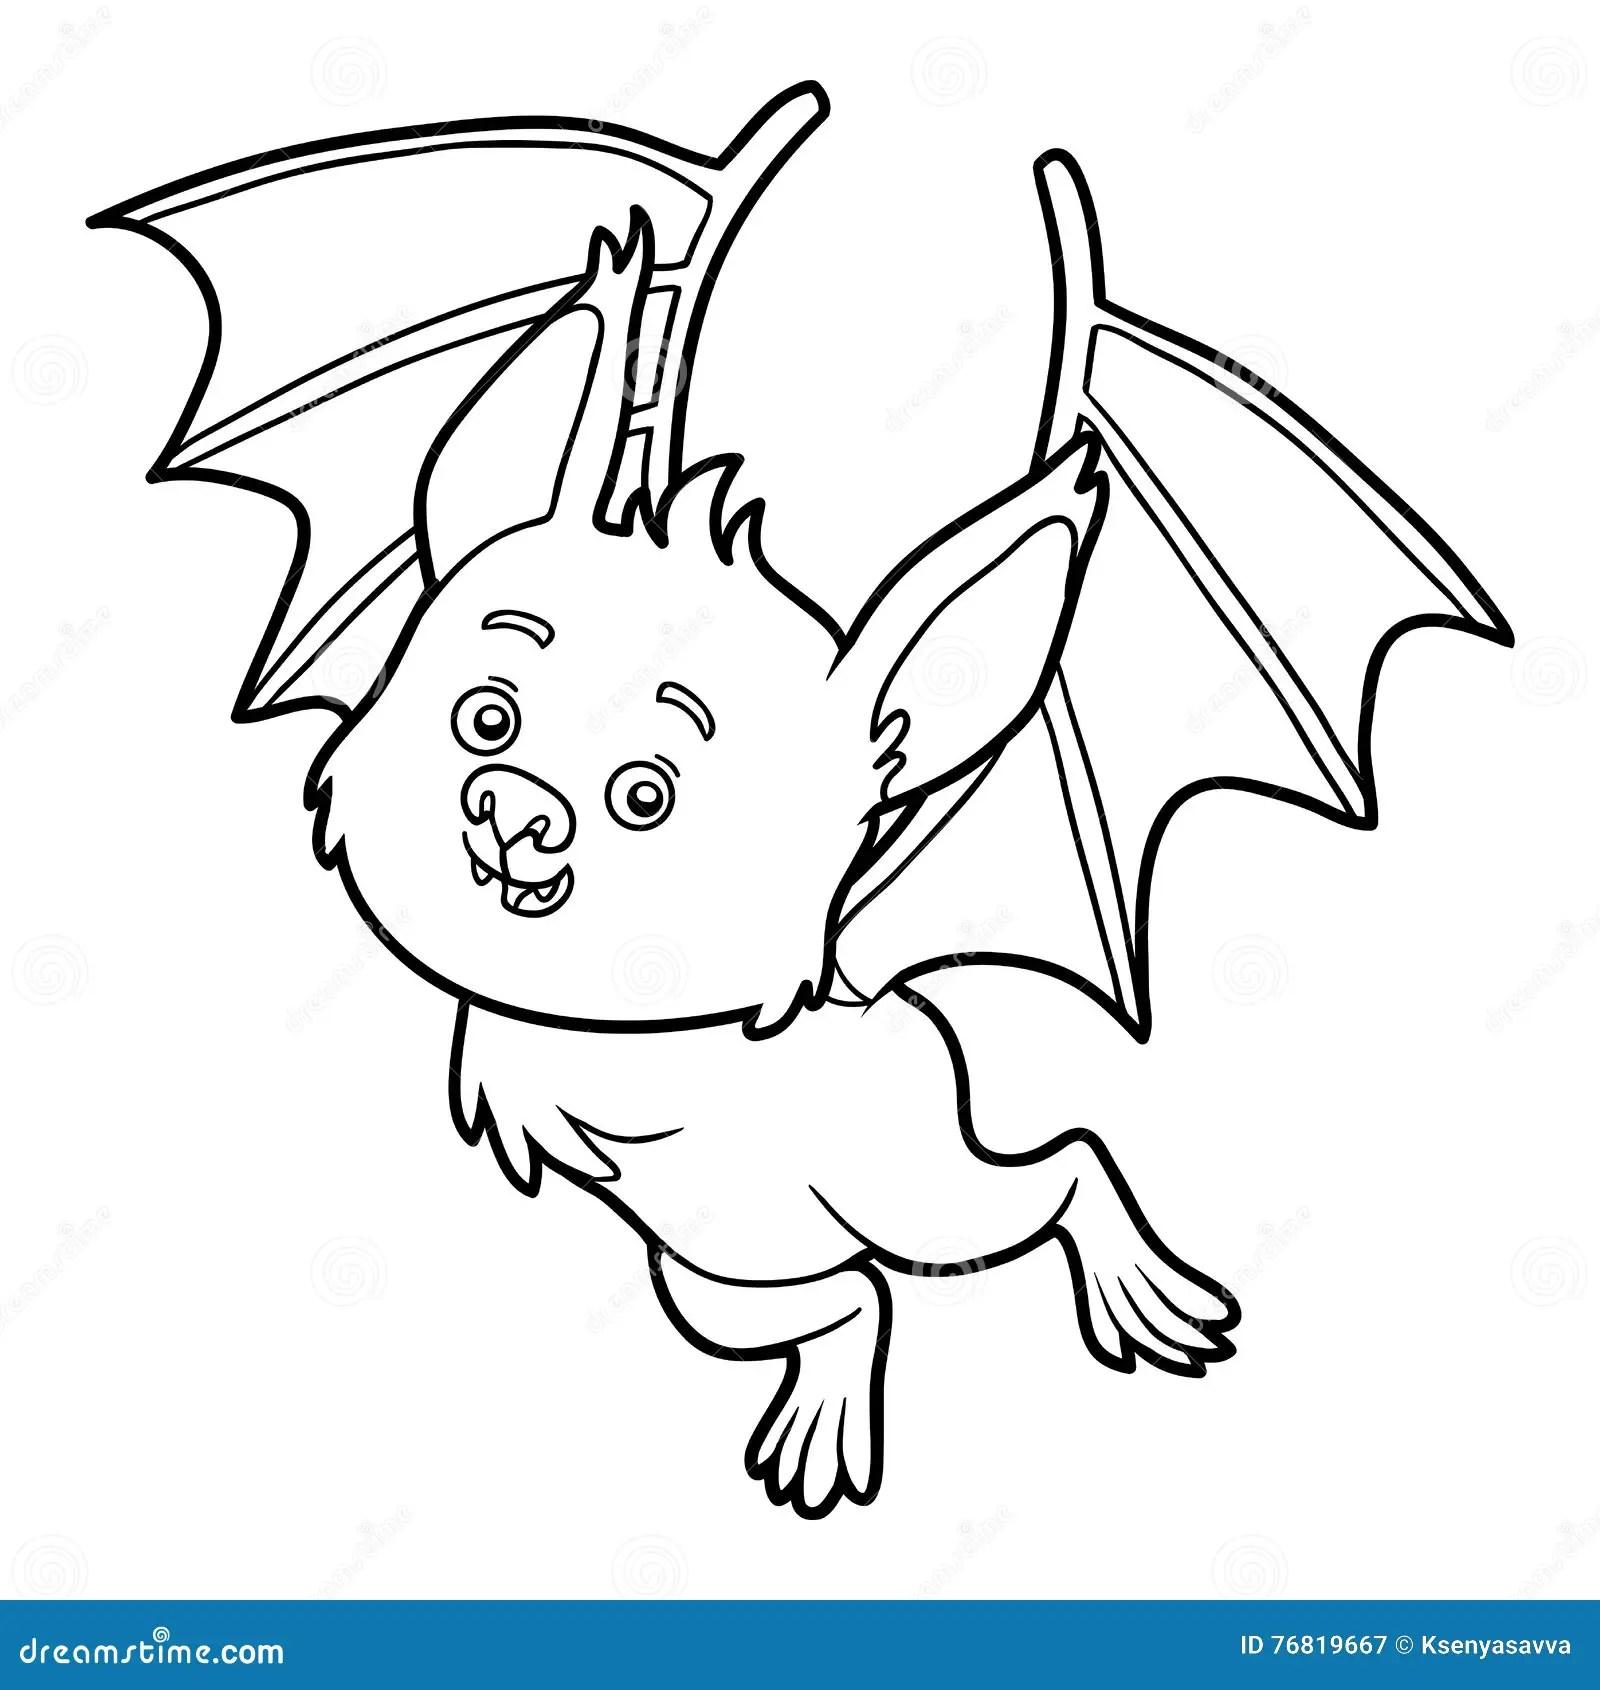 Coloring Book Bat Stock Vector Illustration Of Black